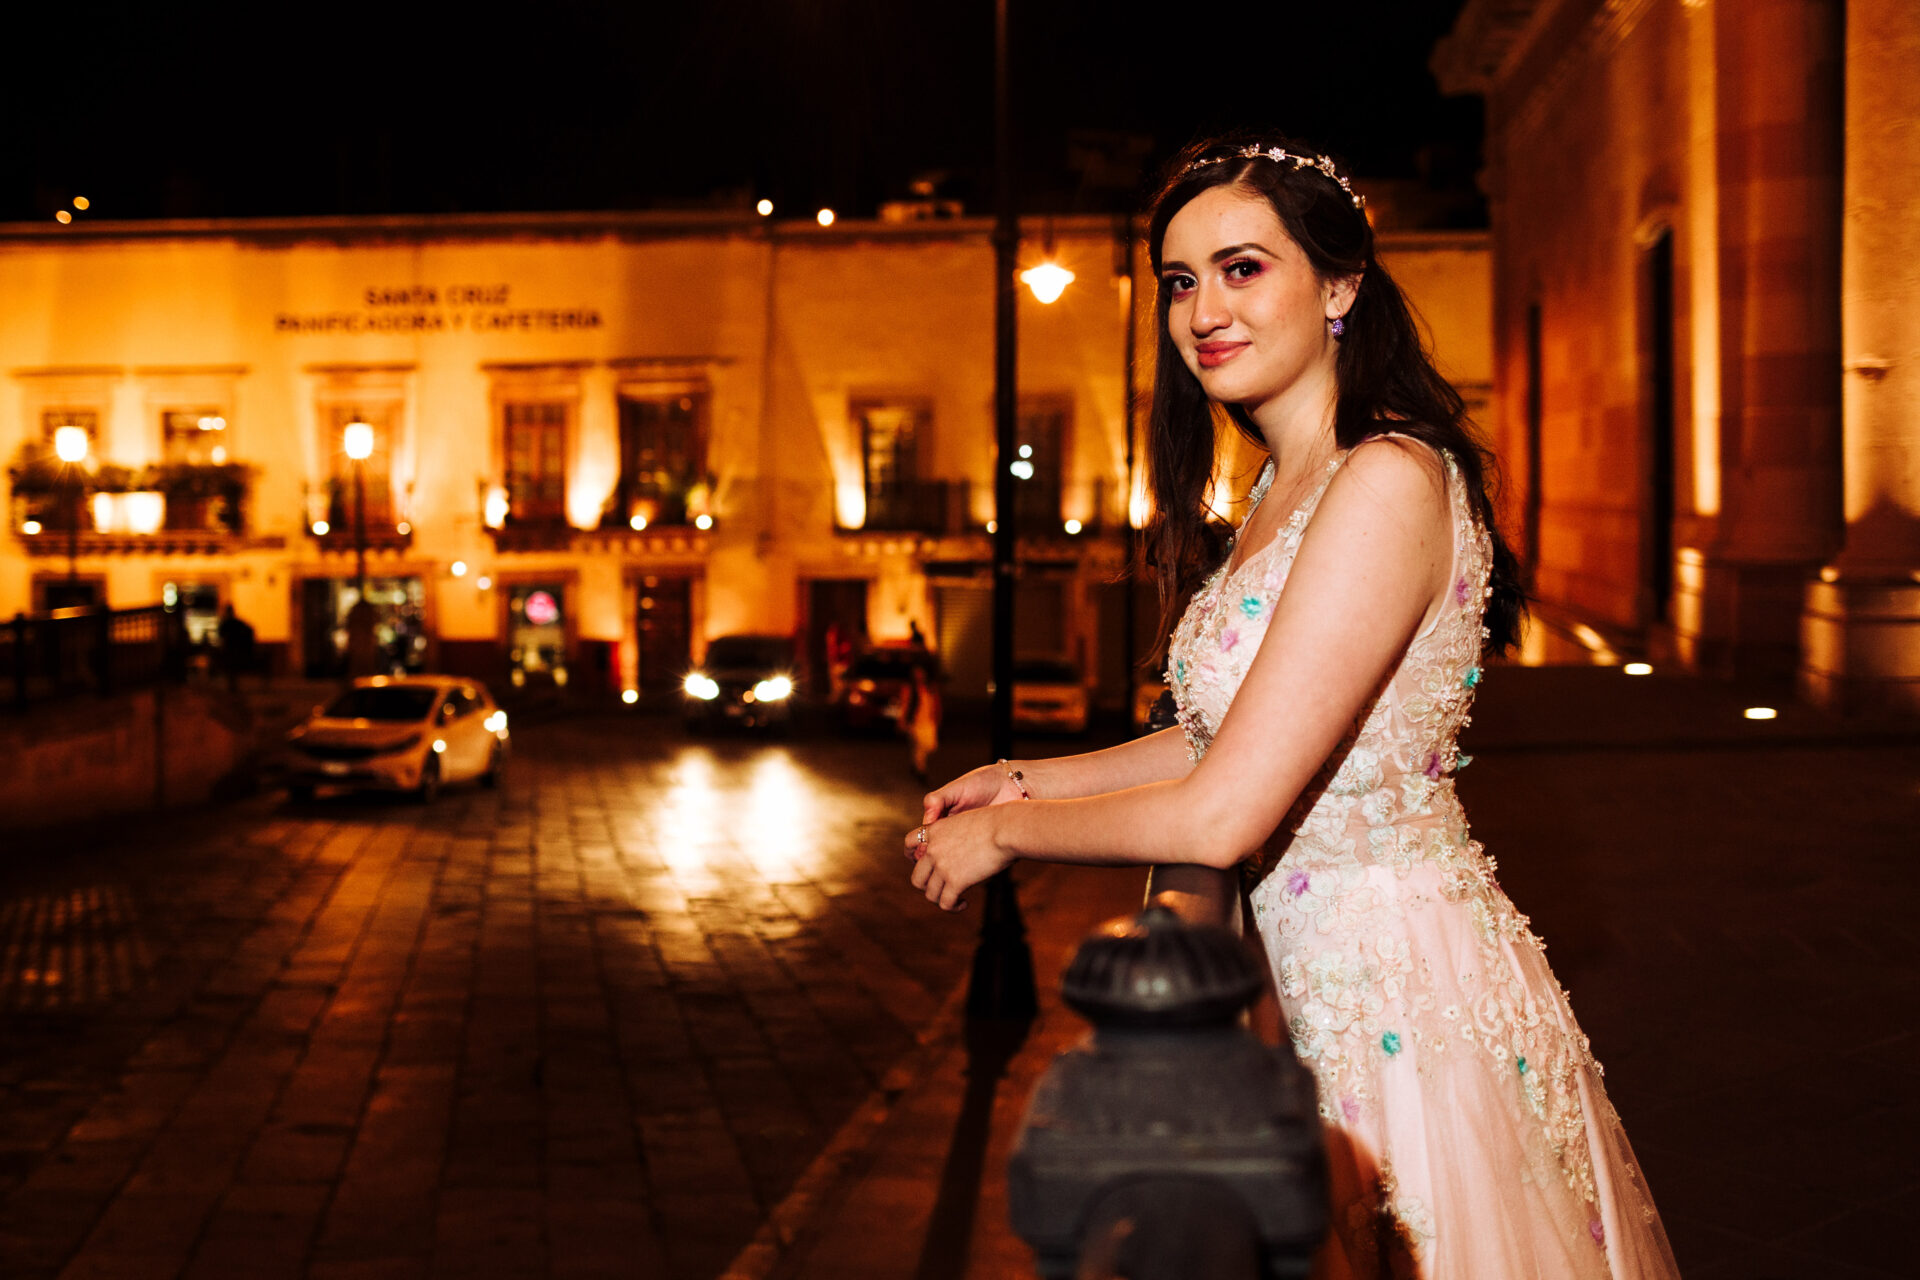 javier_noriega_fotografo_bodas_zacatecas_trash_the_dress_xv_años00014